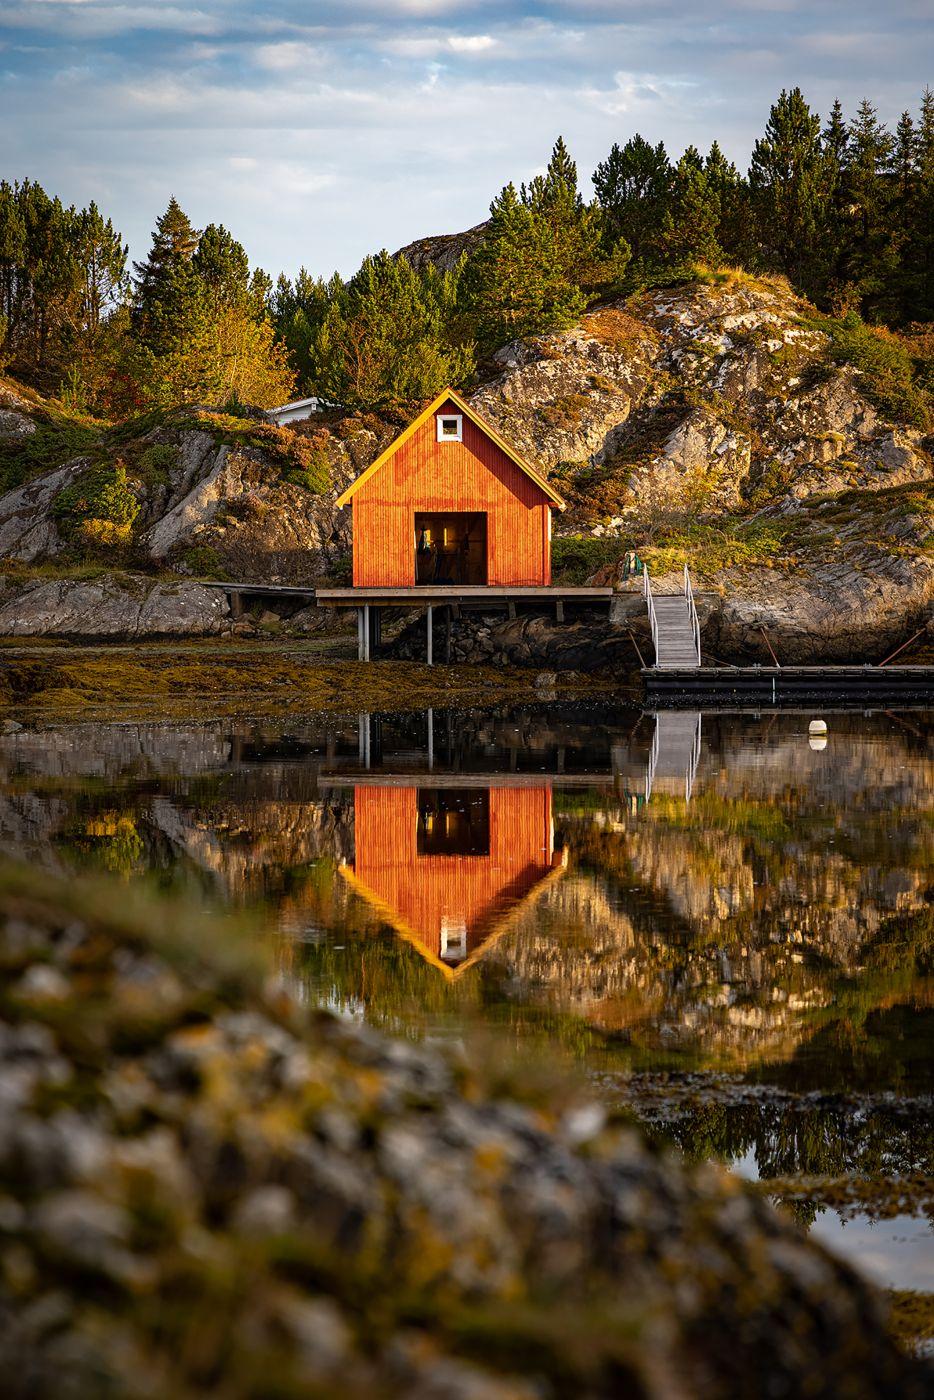 Bootshaus, Norway